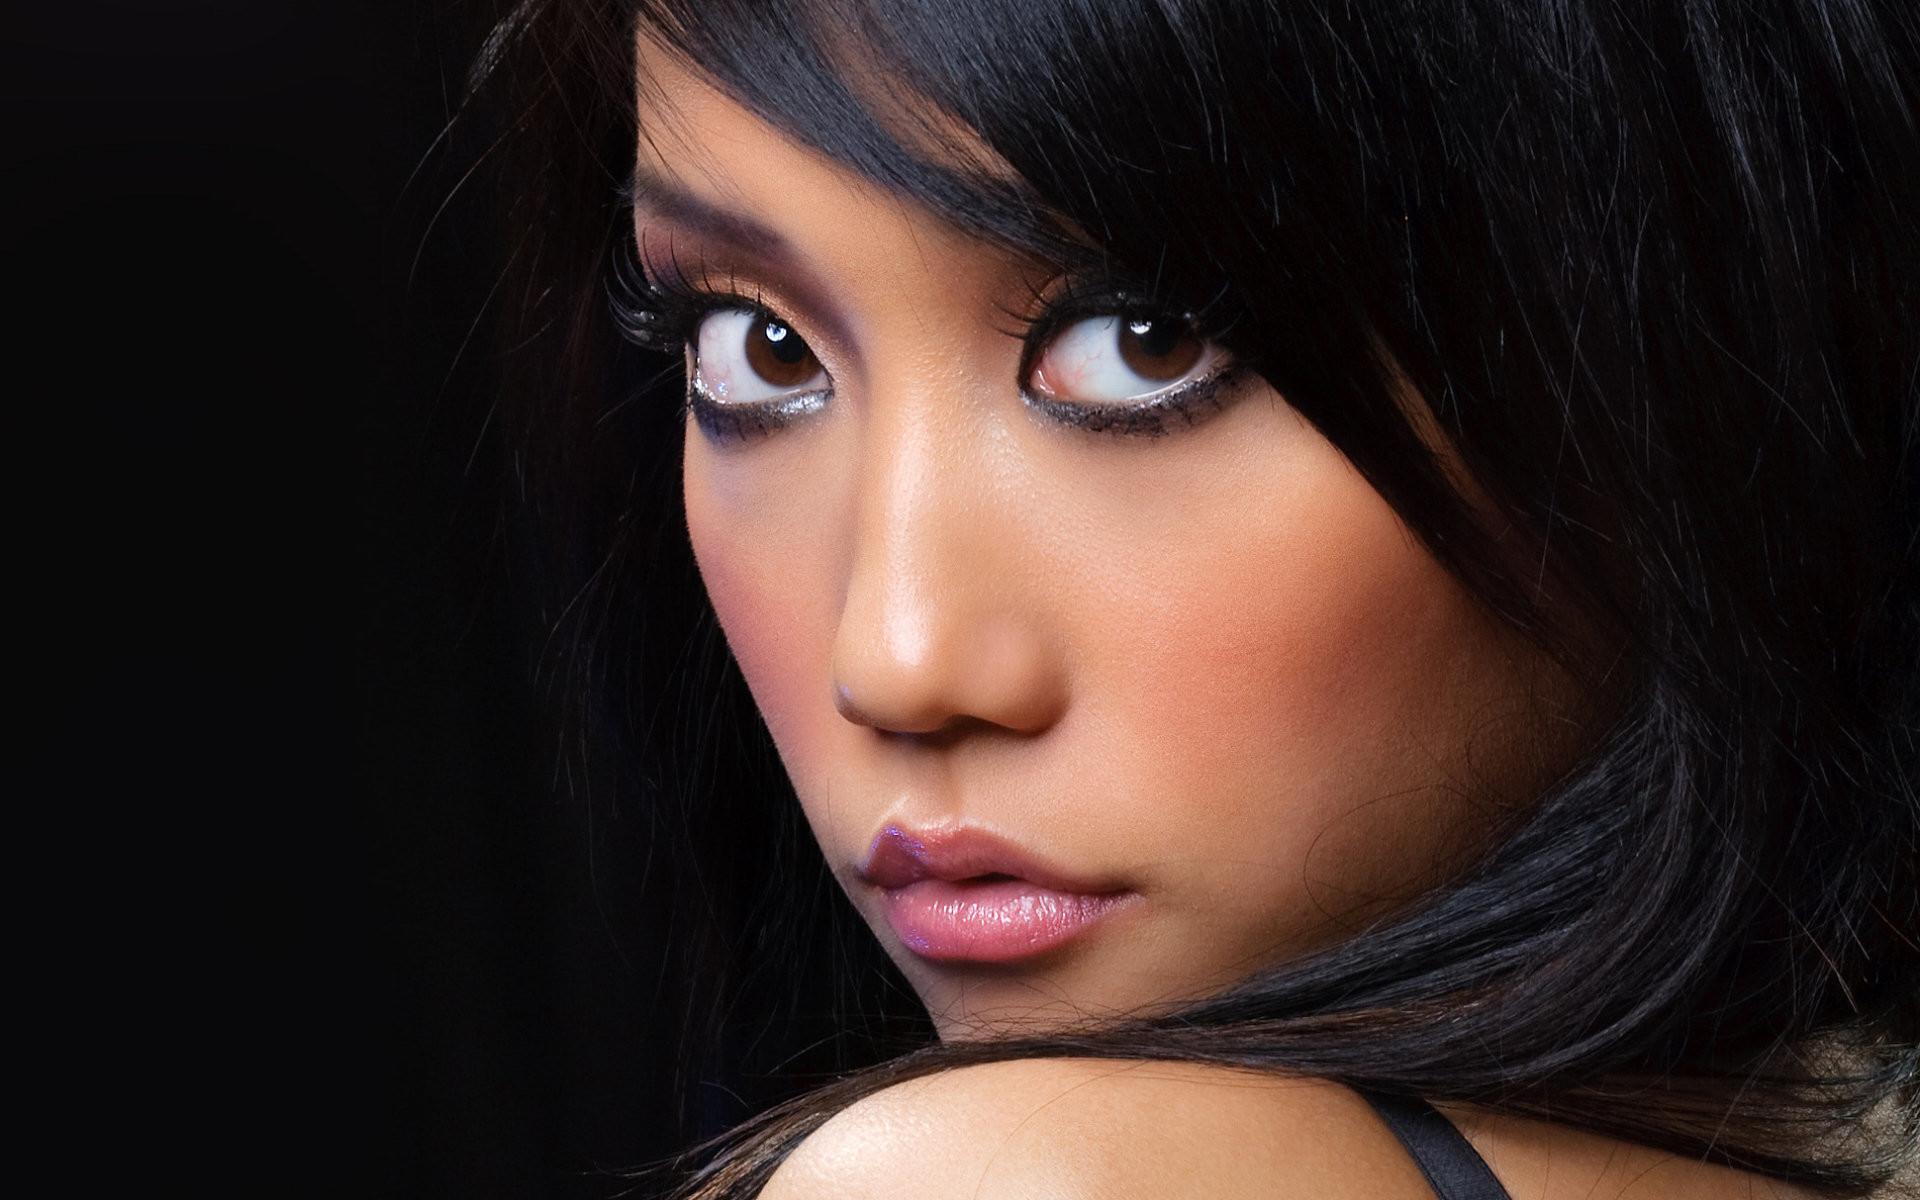 Women – Face Beautiful Pretty Cute Woman Wallpaper